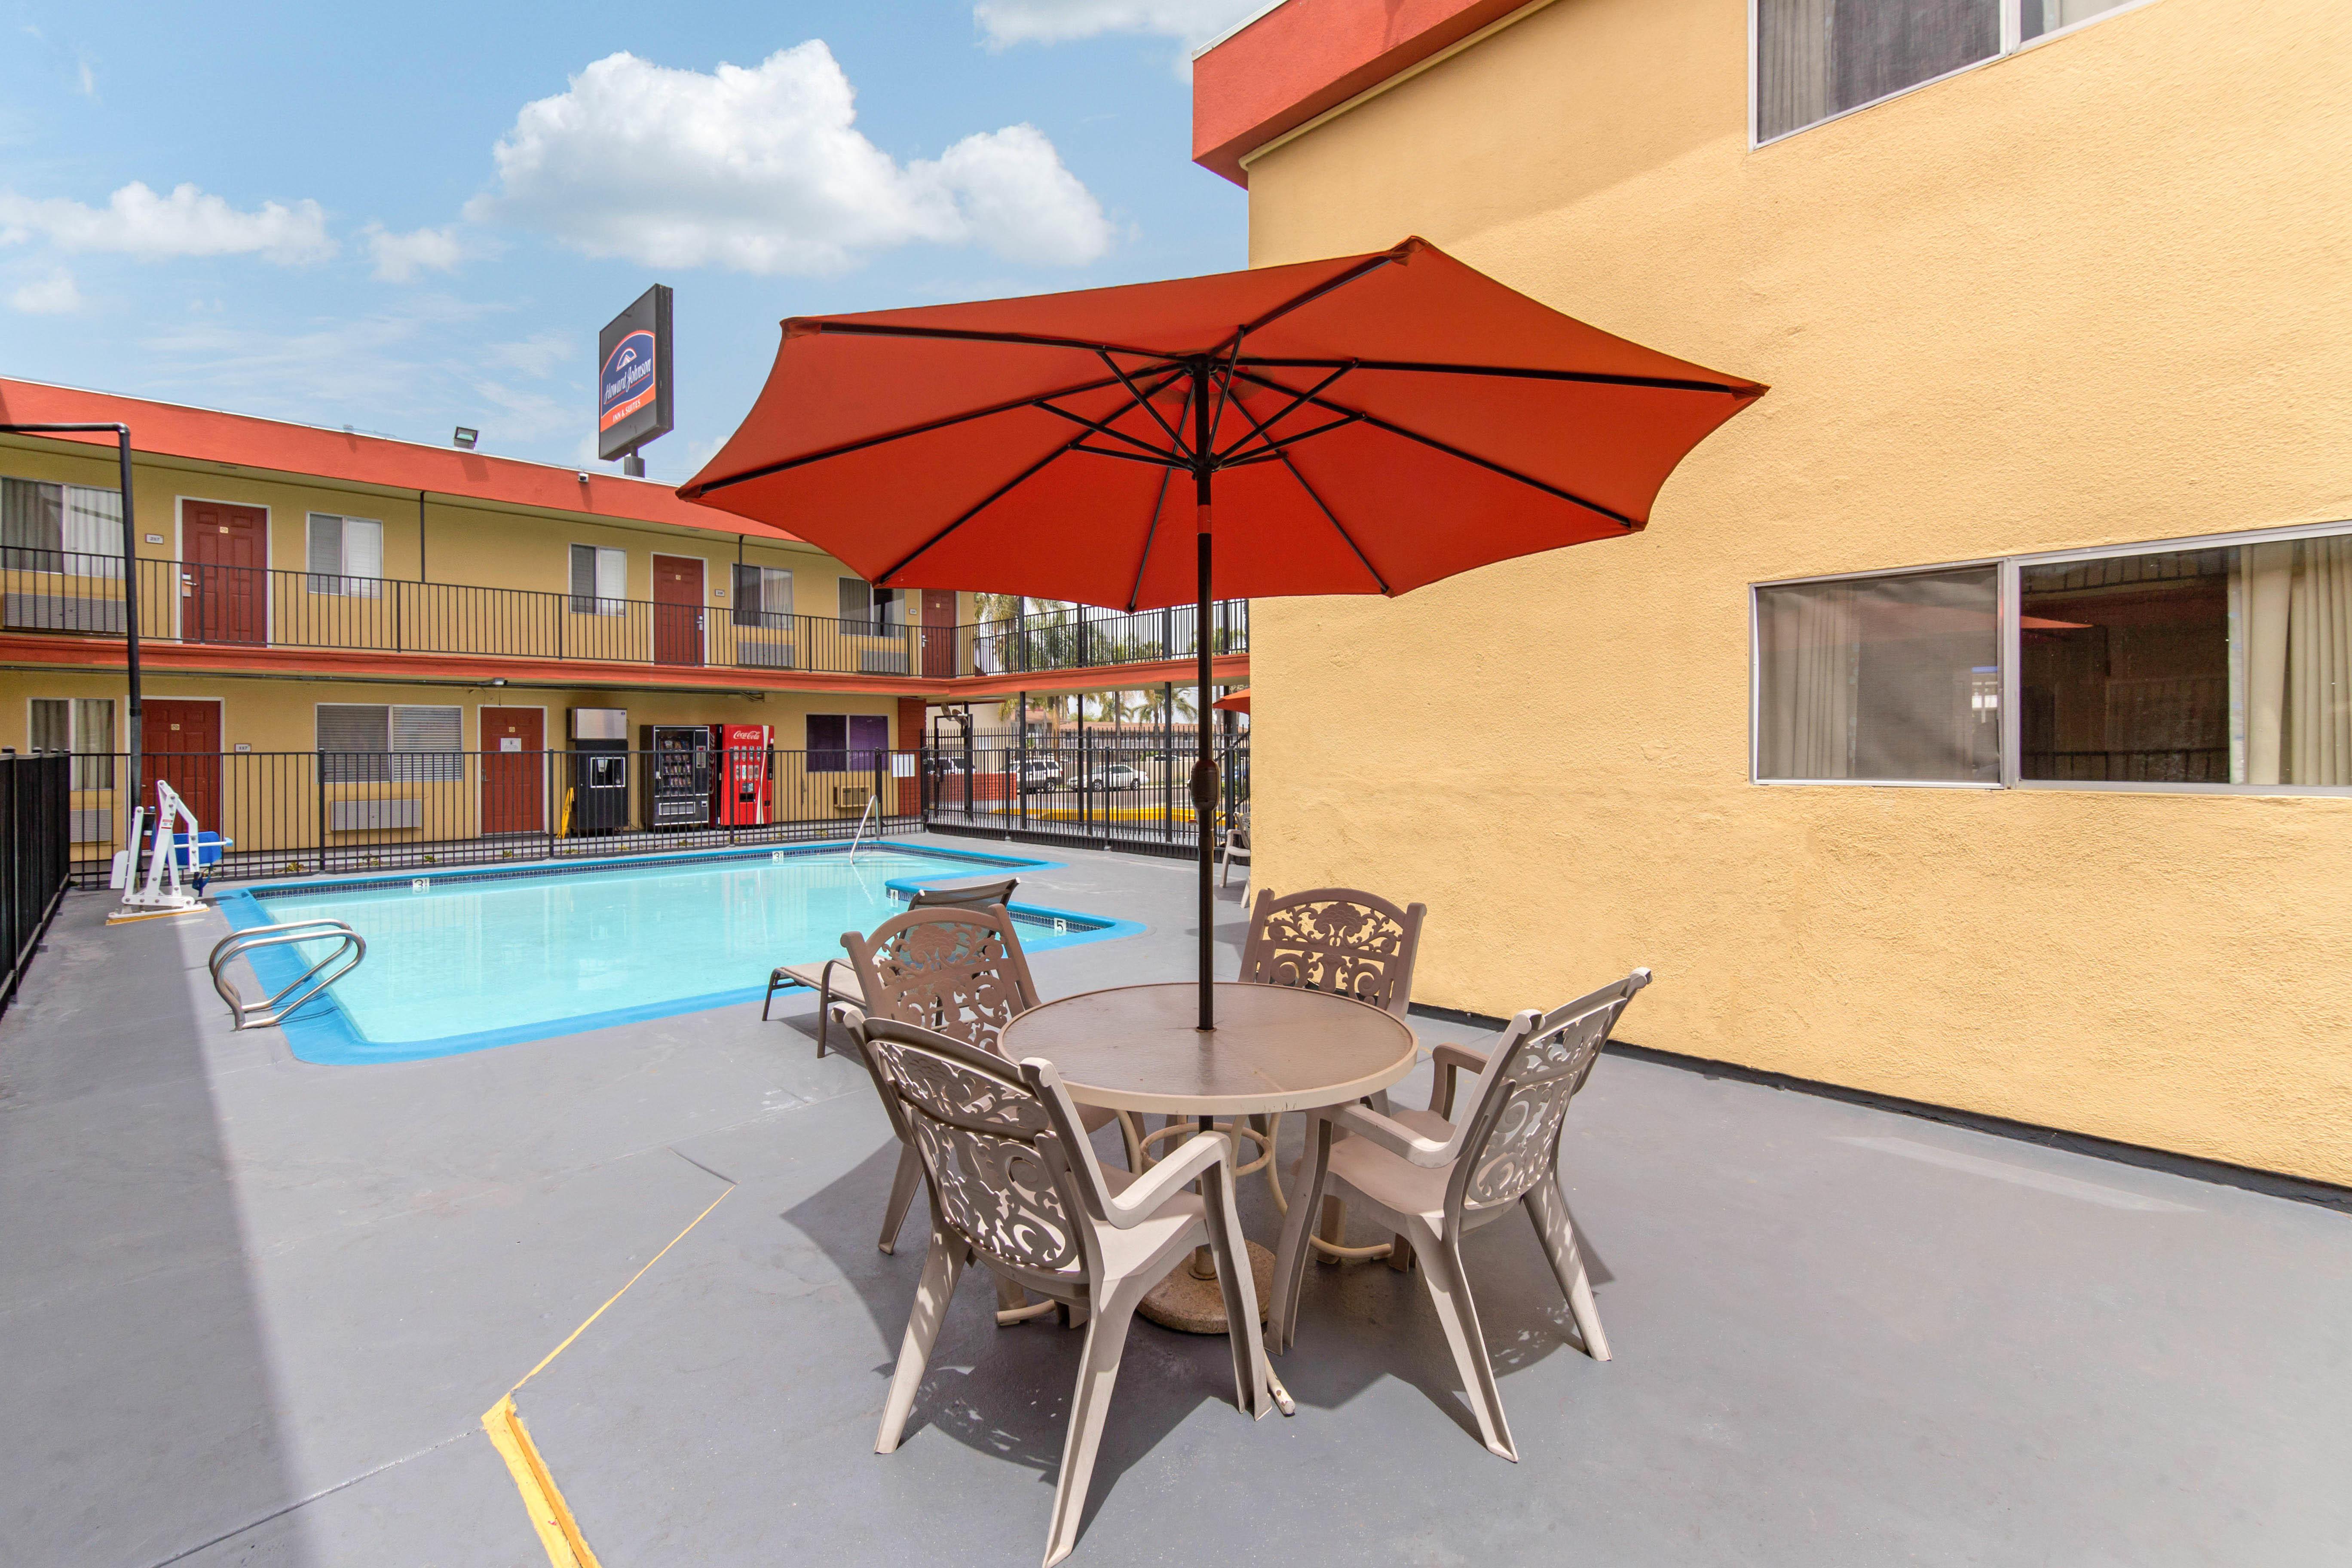 Howard Johnson by Wyndham Chula Vista San Diego Suite Hotel image 18